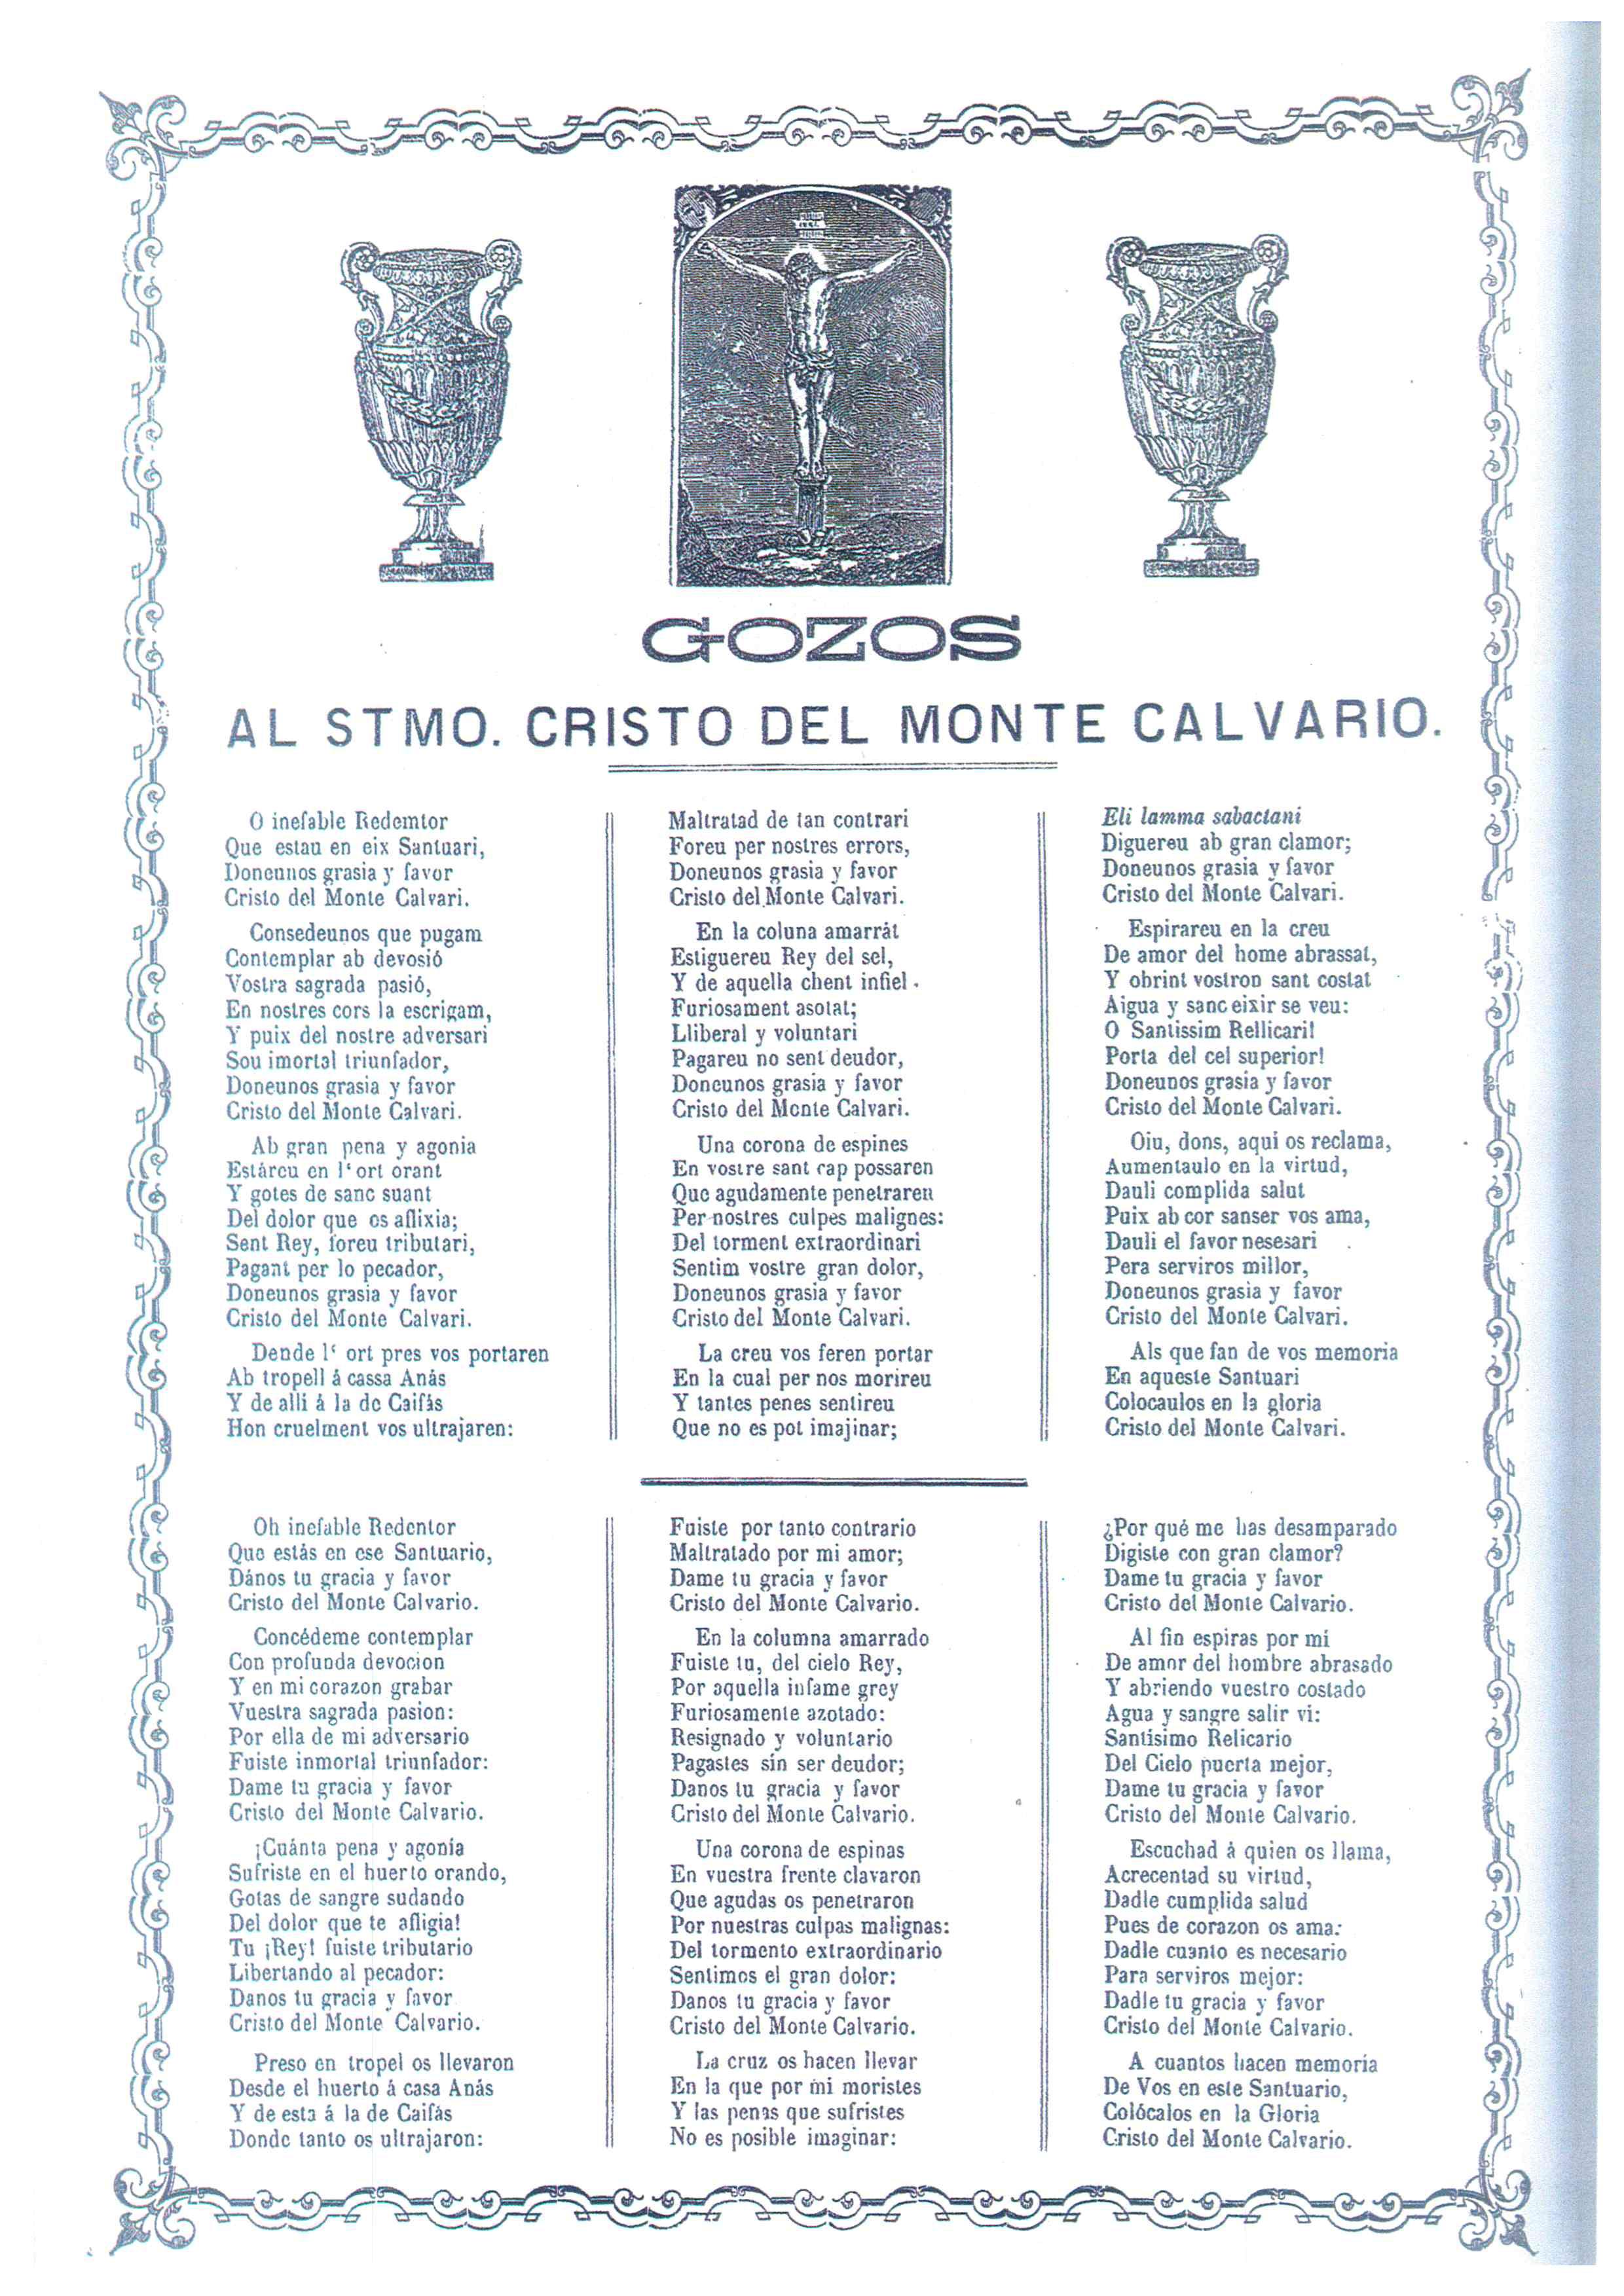 ElCristo - Gozos - Antiguos - Miguel Amat